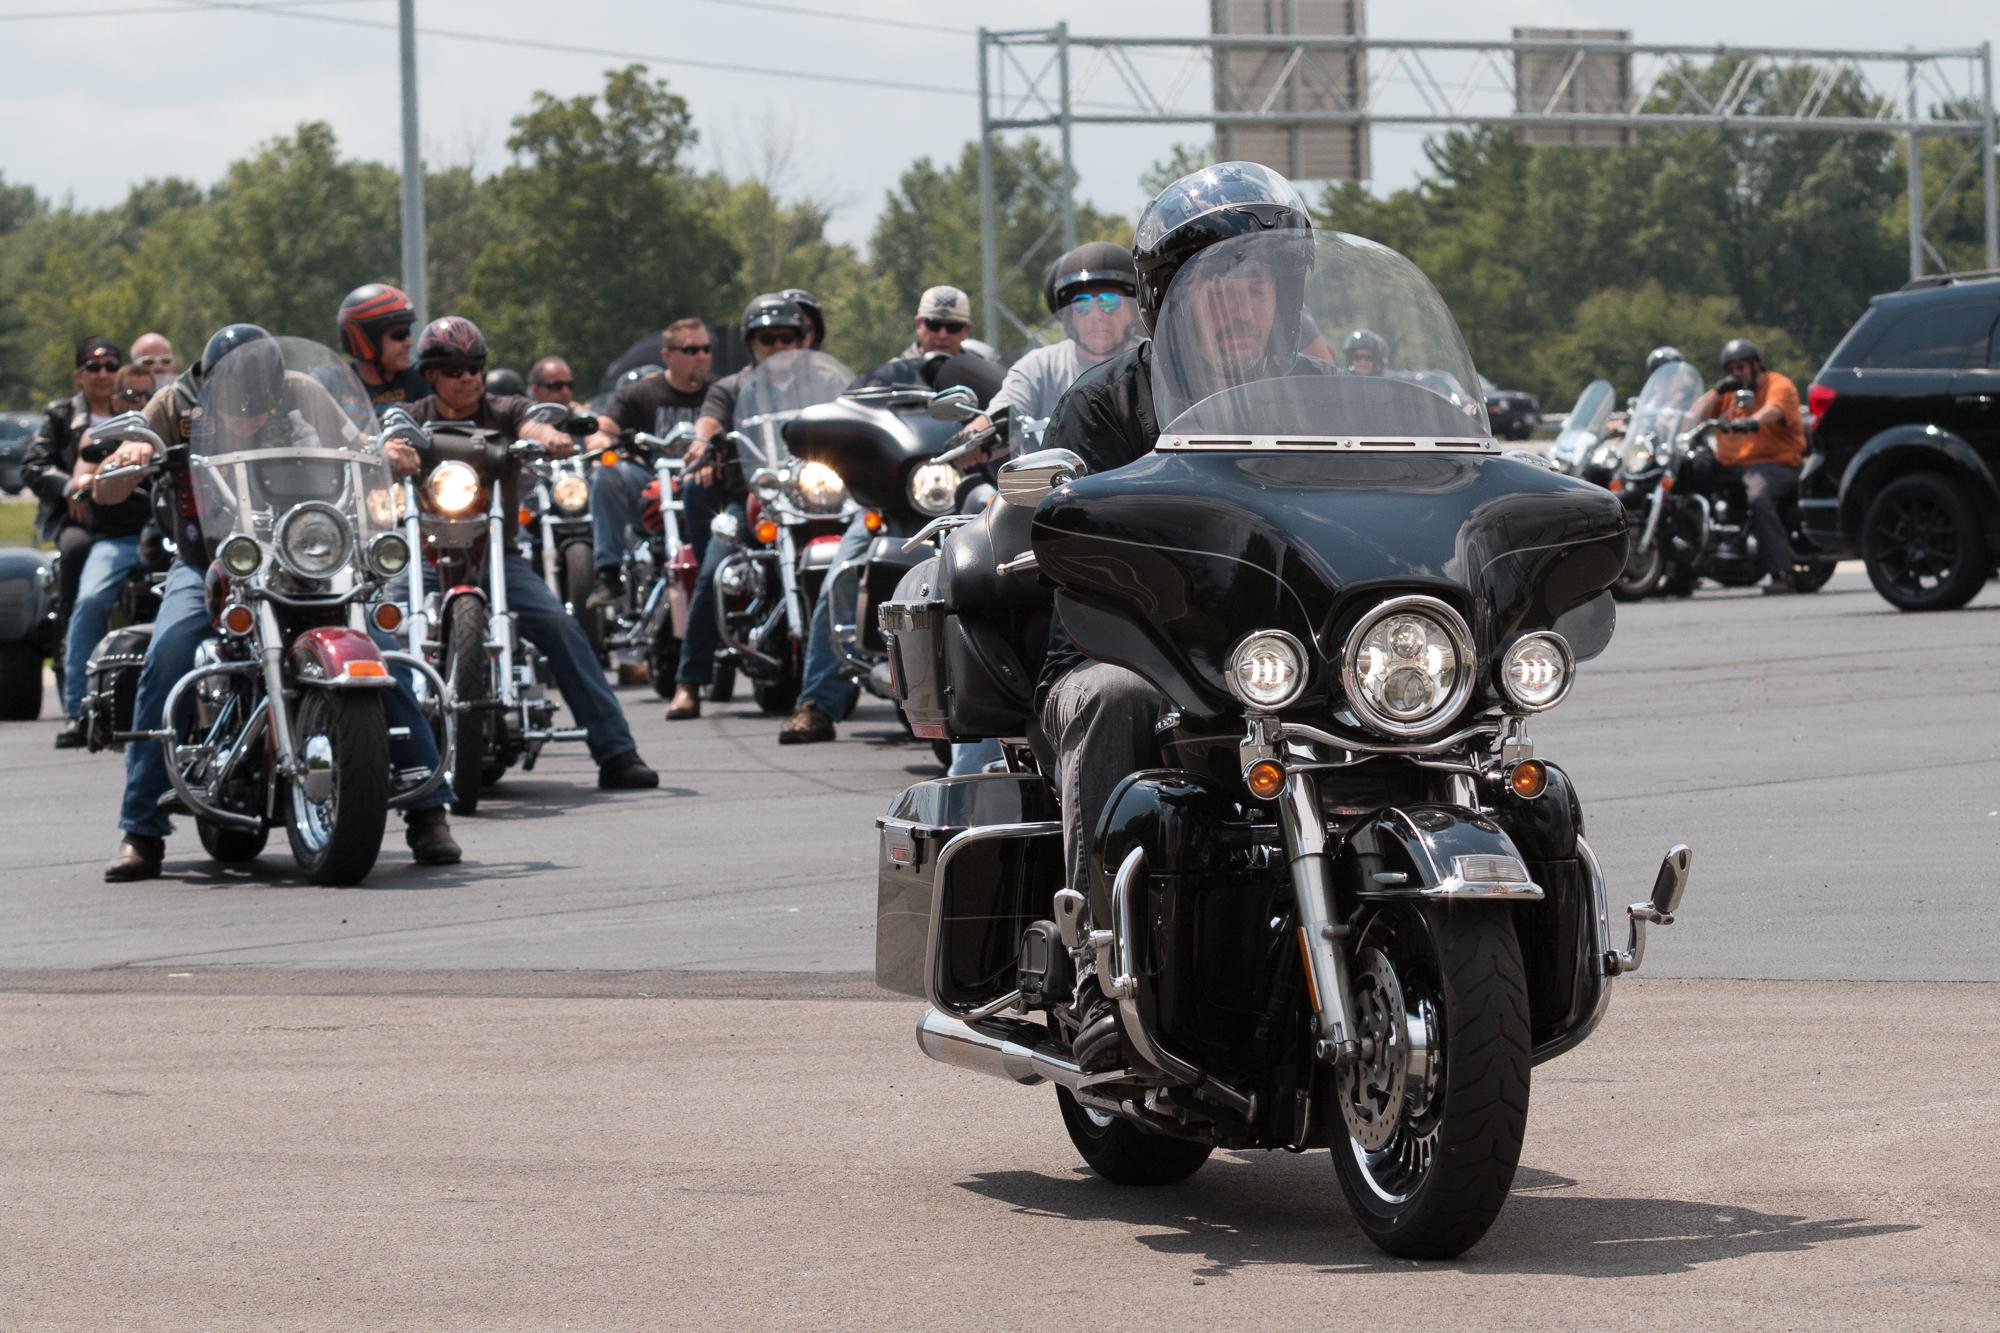 054_bikes.jpg